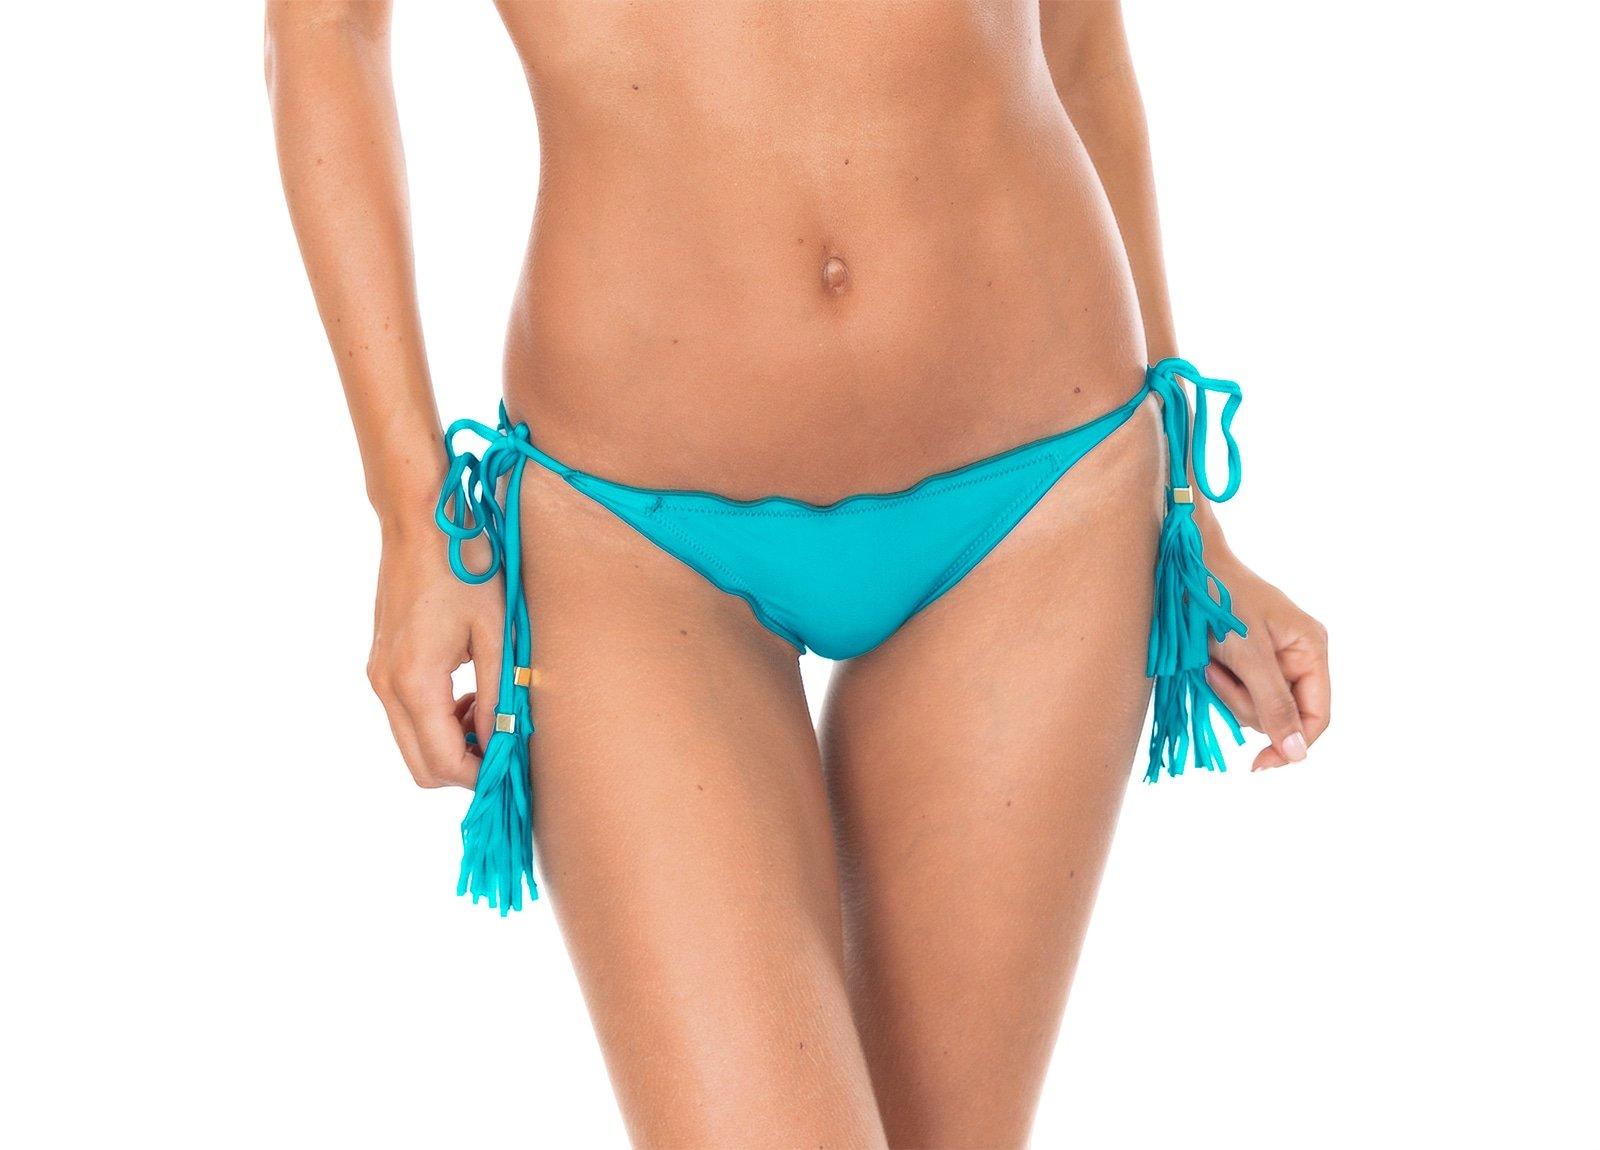 Sky Blue Scrunch Bikini Bottom With Tassels Calcinha Ambra Frufru Nannai